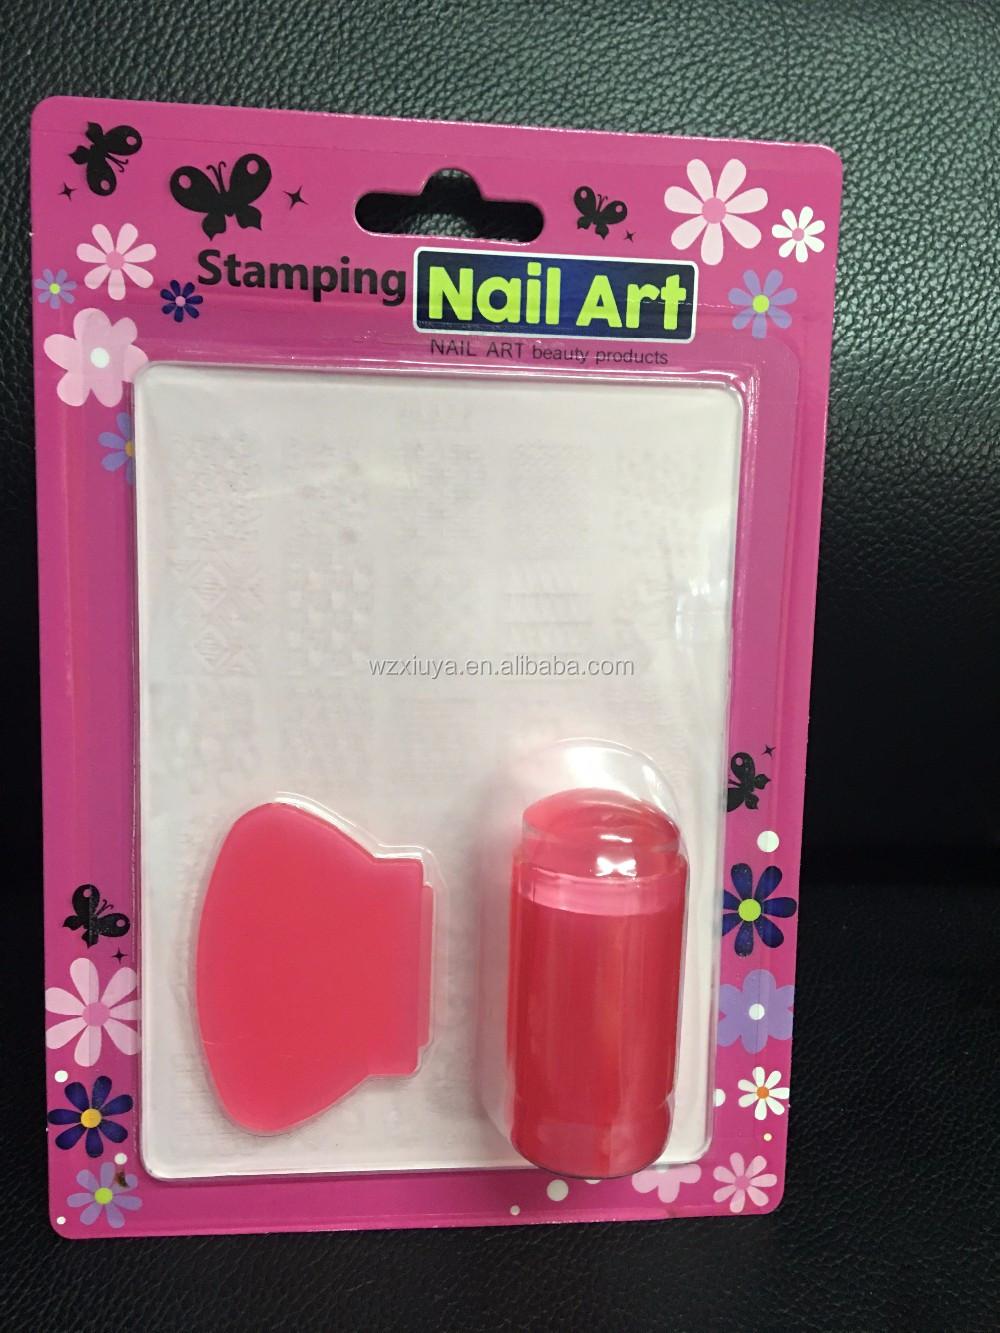 Acrylic Plate Stamping Nail Art Kit Buy Stamping Nail Art Set